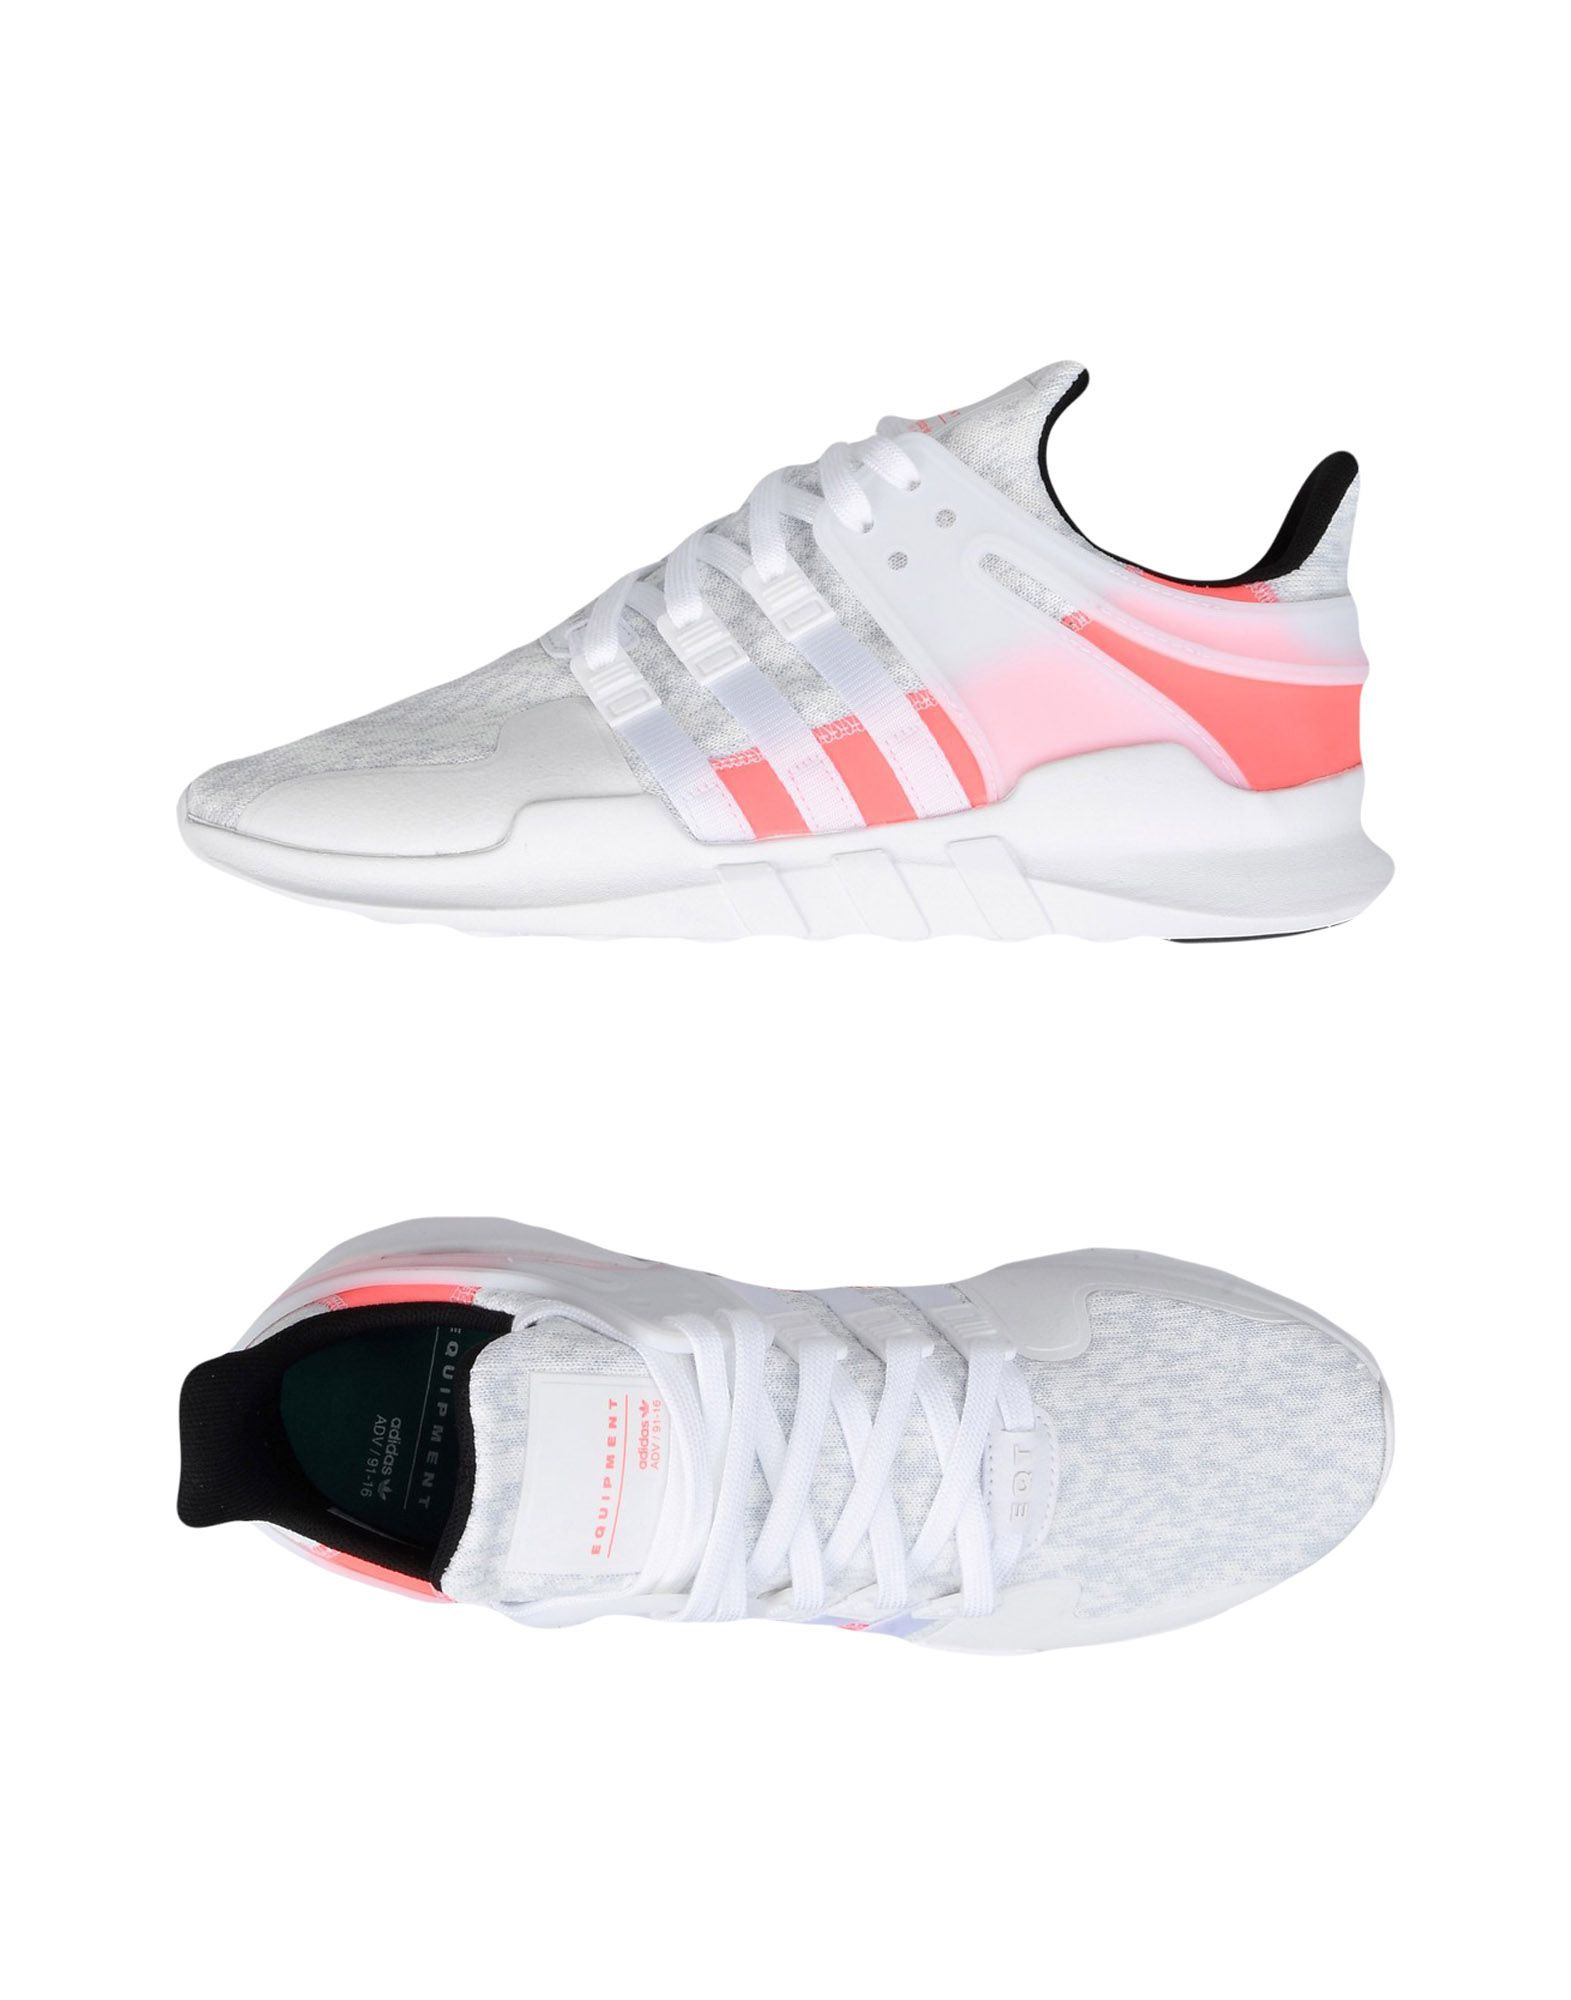 Sneakers Adidas Originals Eqt Support Adv - Uomo - 11241488WB